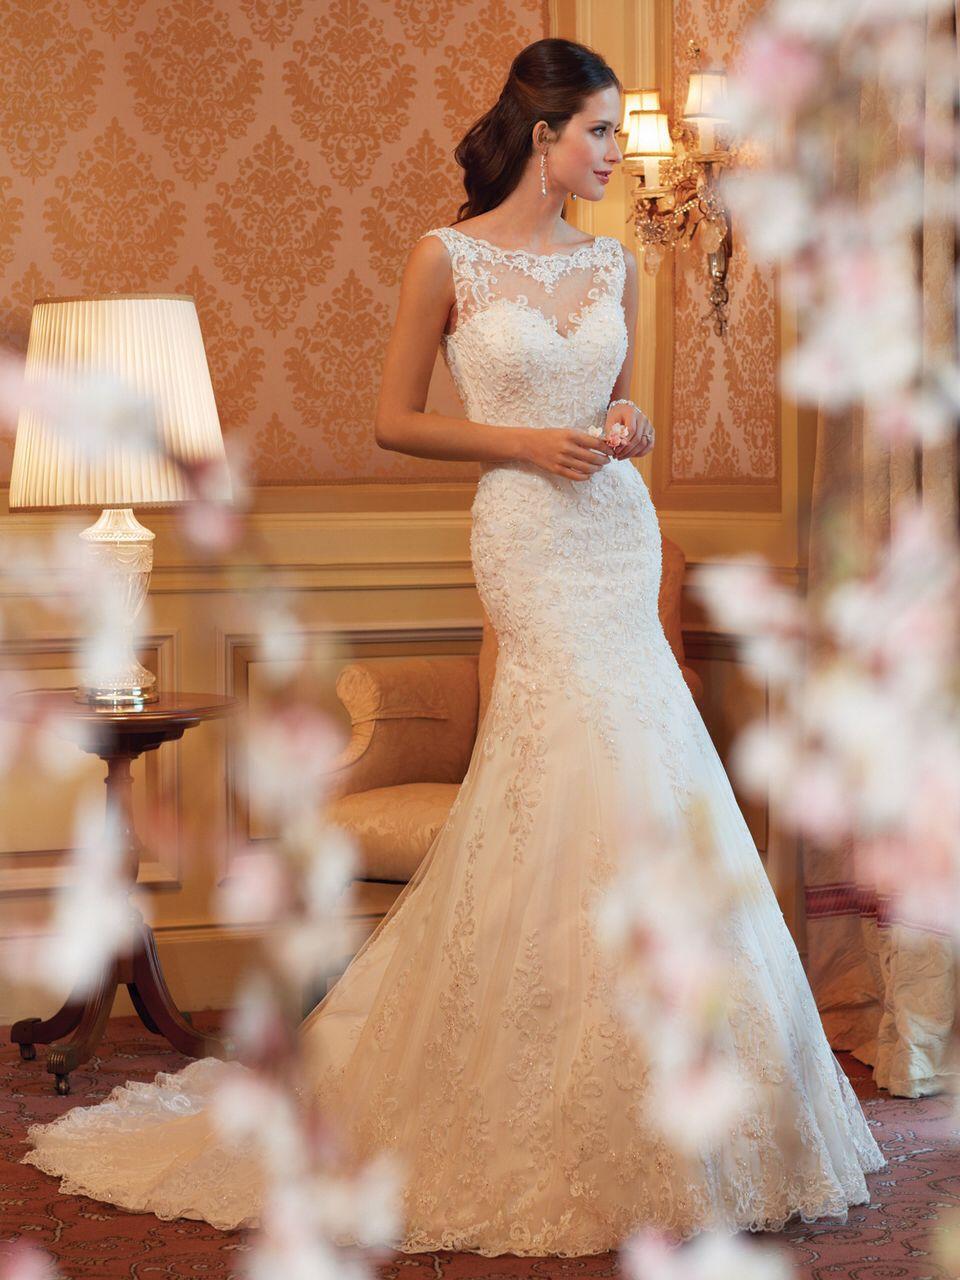 Dress to wear at a wedding  Beautiful wedding dress  Wedding  Pinterest  Vintage lace dresses